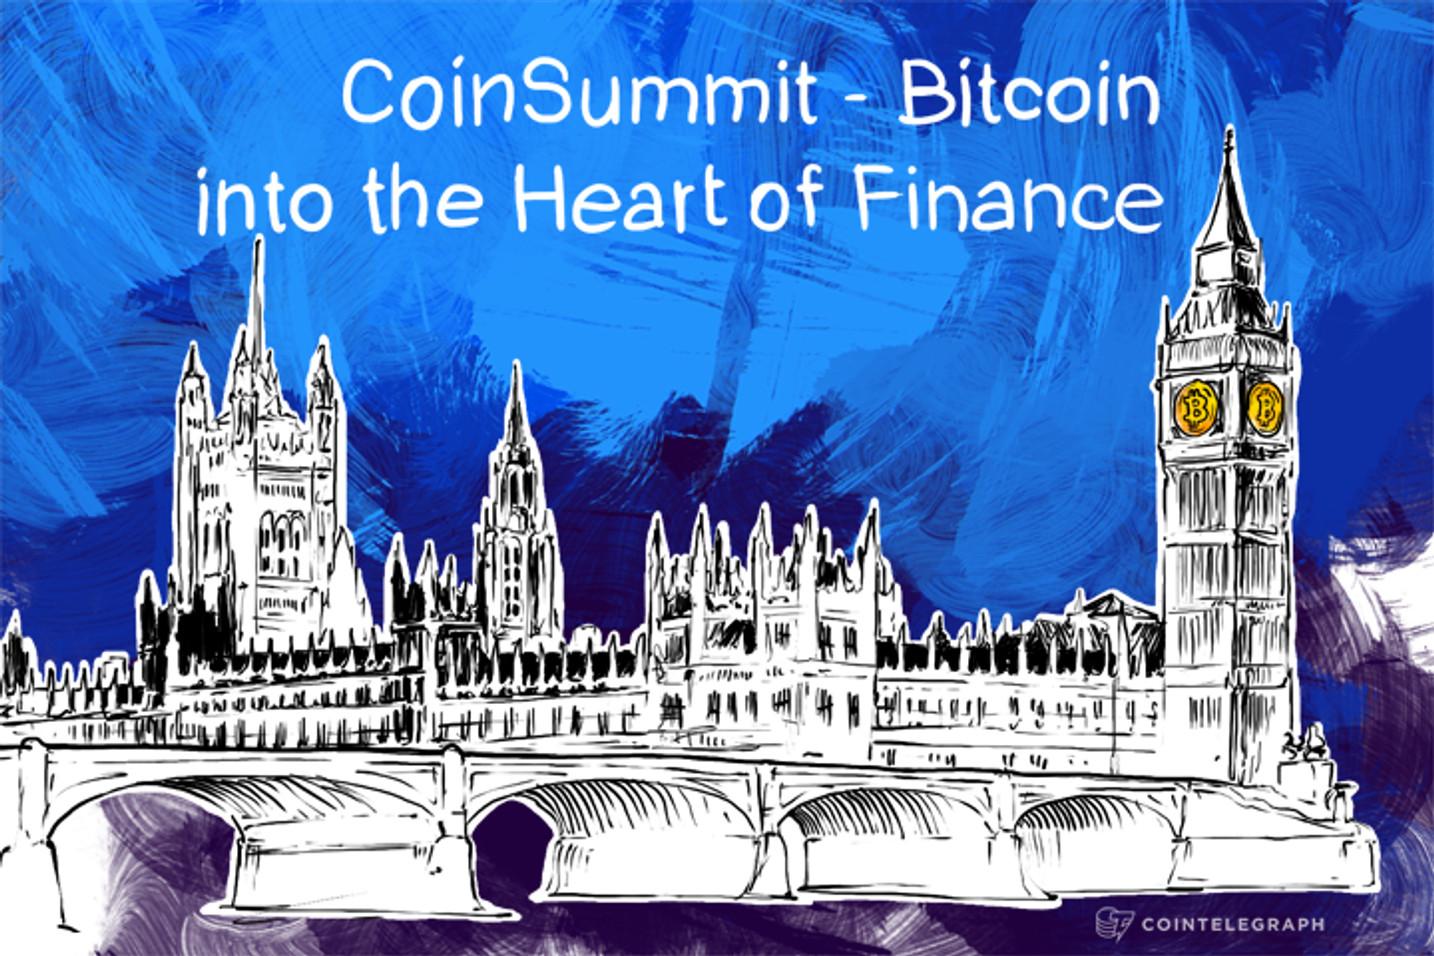 CoinSummit - Bitcoin into the Heart of Finance